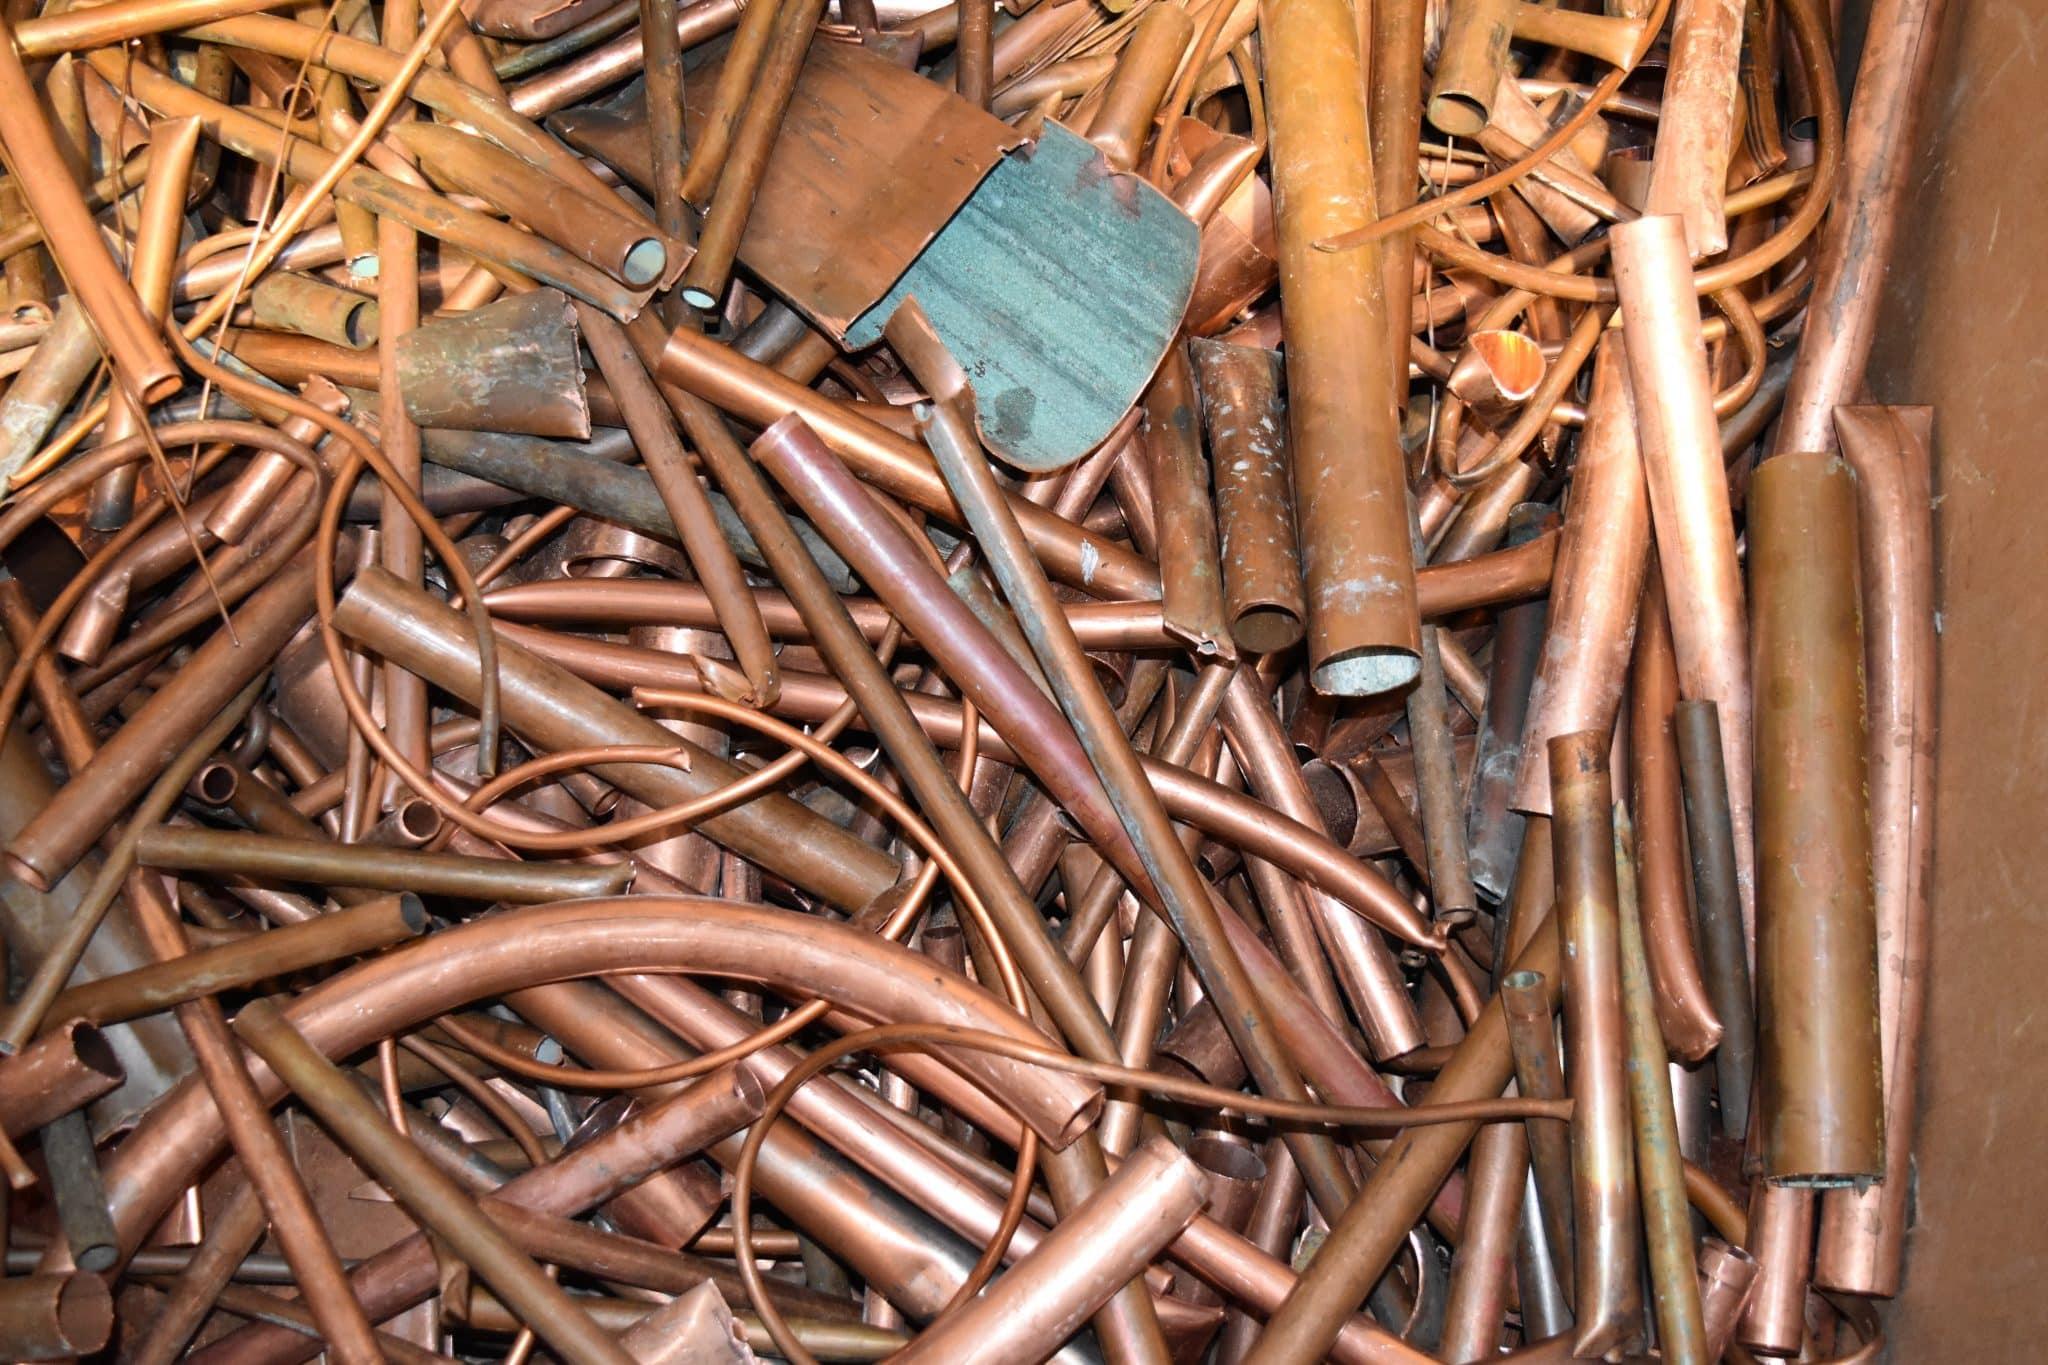 6/2/16 Scrap Price Update: Copper, Aluminum Both Drop ...